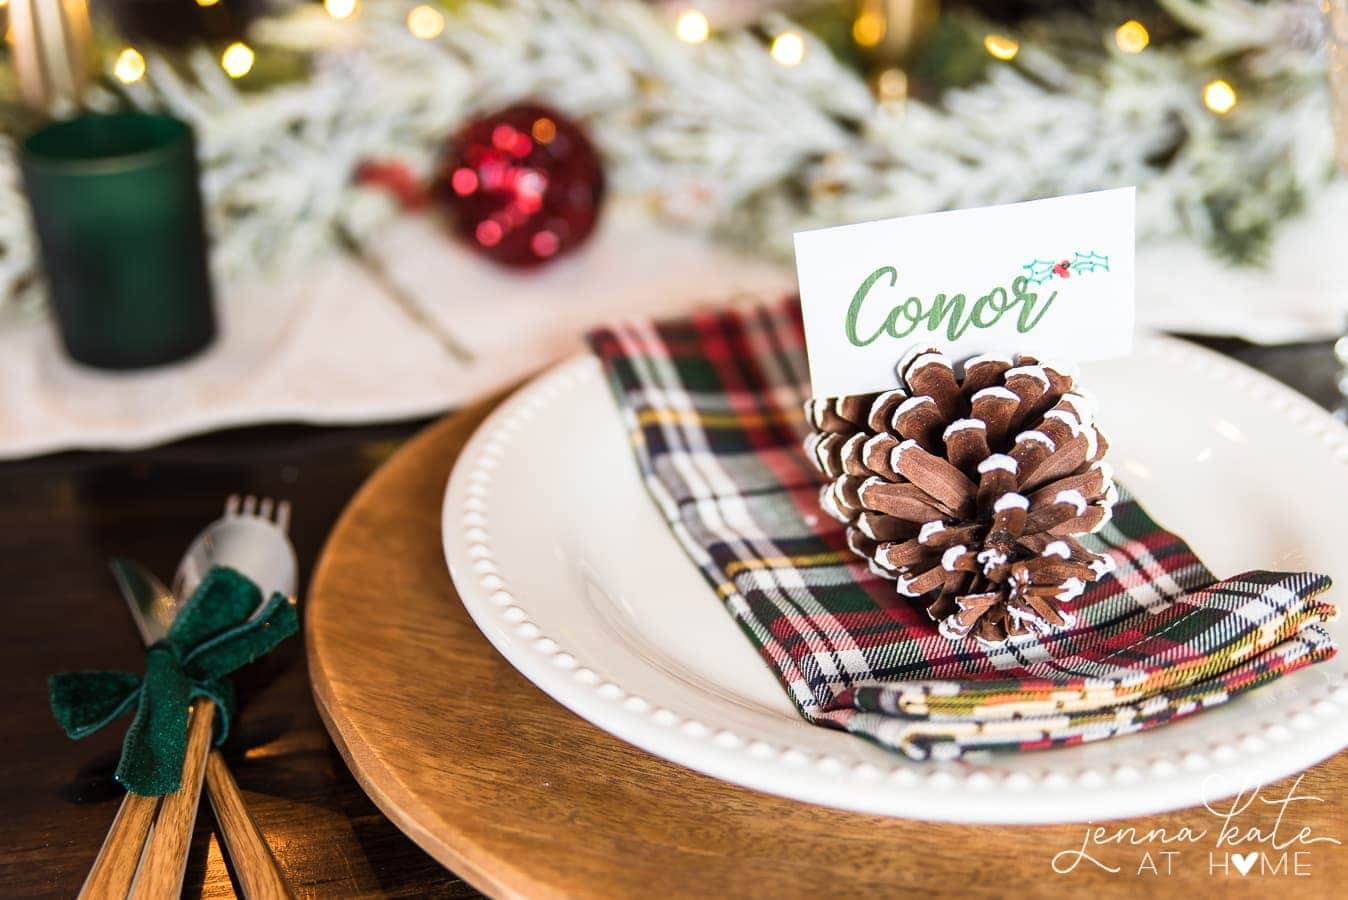 Simple Christmas table setting ideas